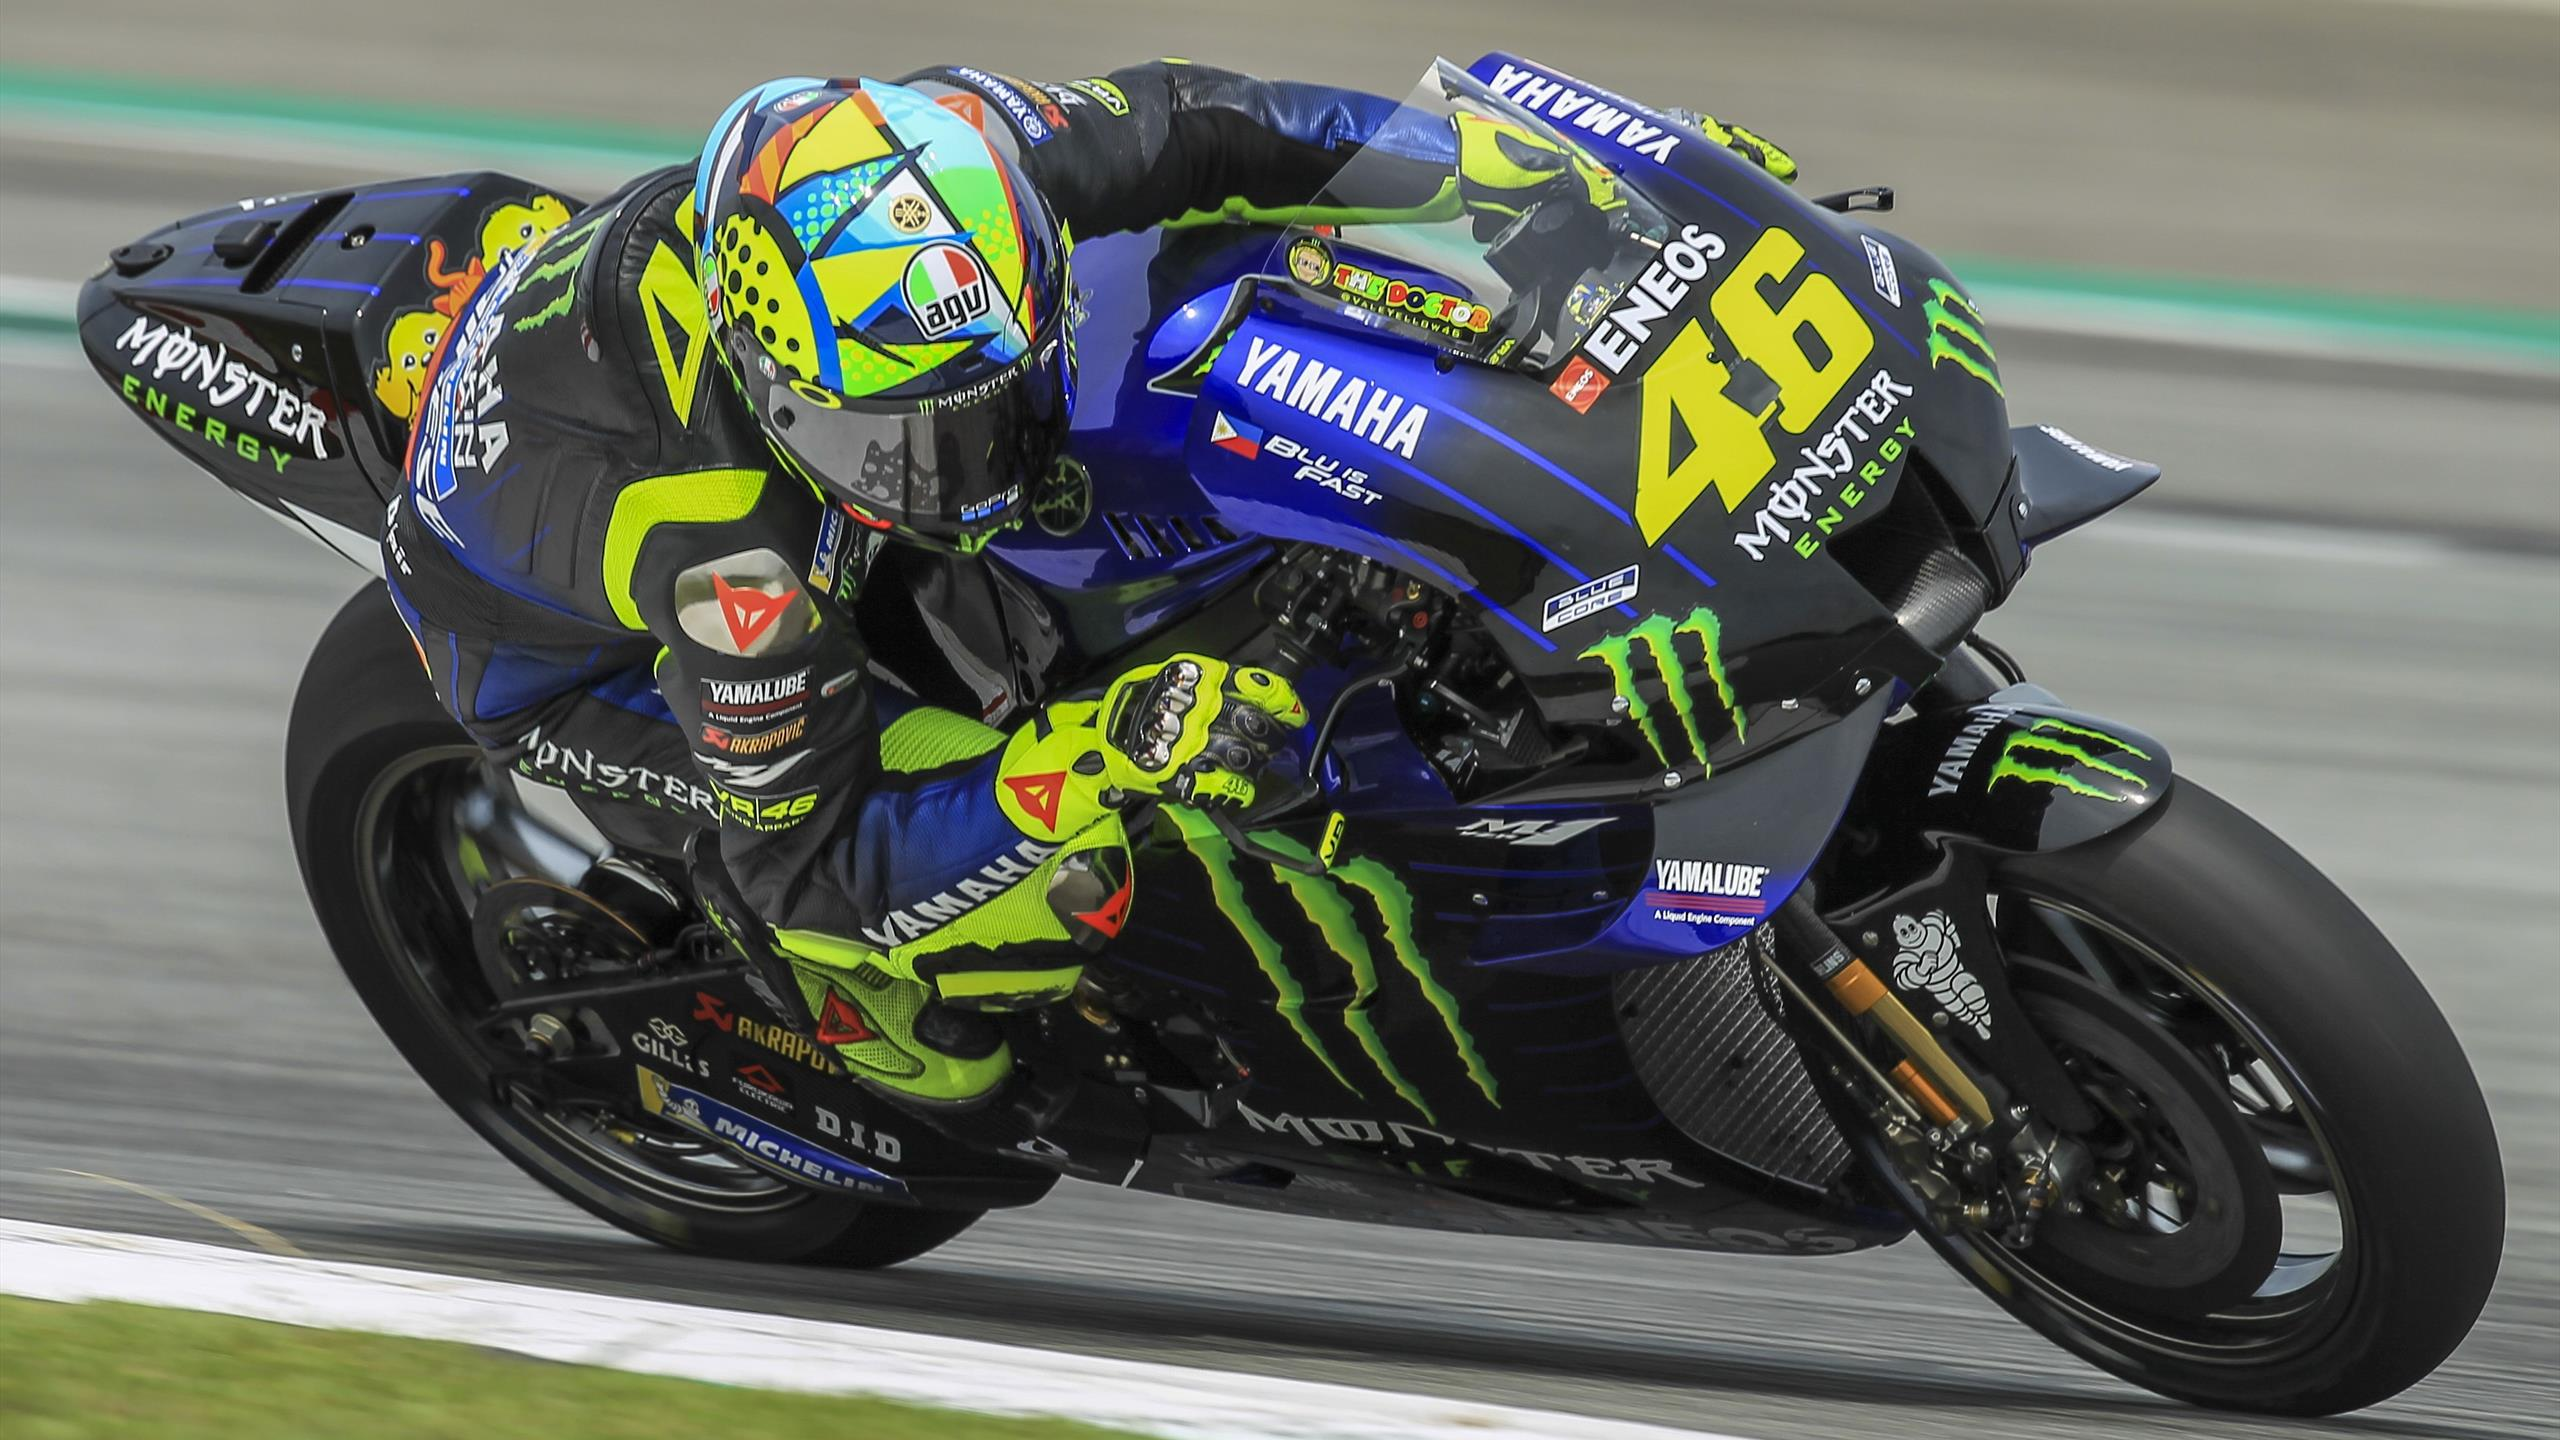 Motogp News Valentino Rossi Expects To Decide Future Before Season Starts Eurosport